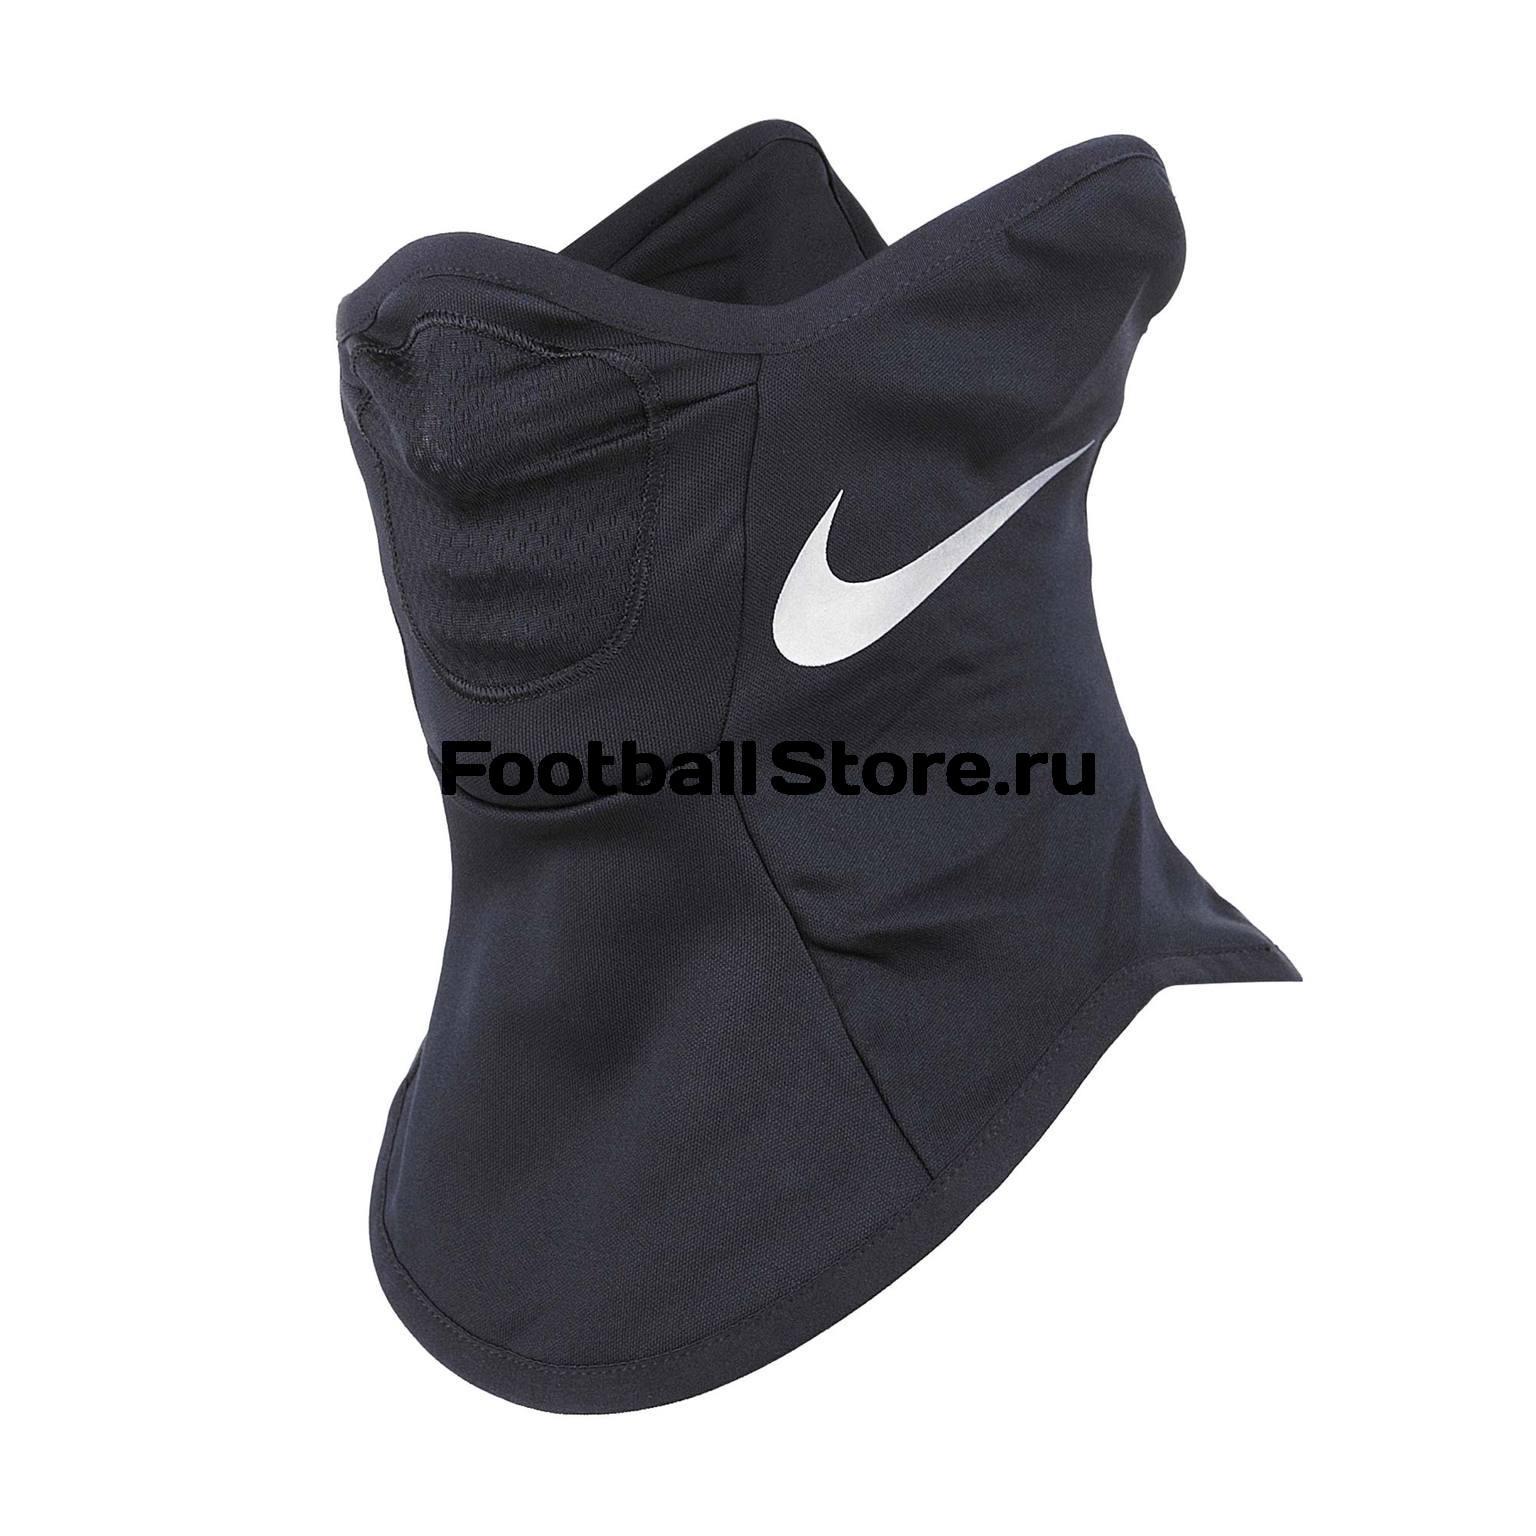 bfef26e0a23b4 Повязка на шею Nike SQD Snood (Гейтор) AQ8233-011 – купить в ...